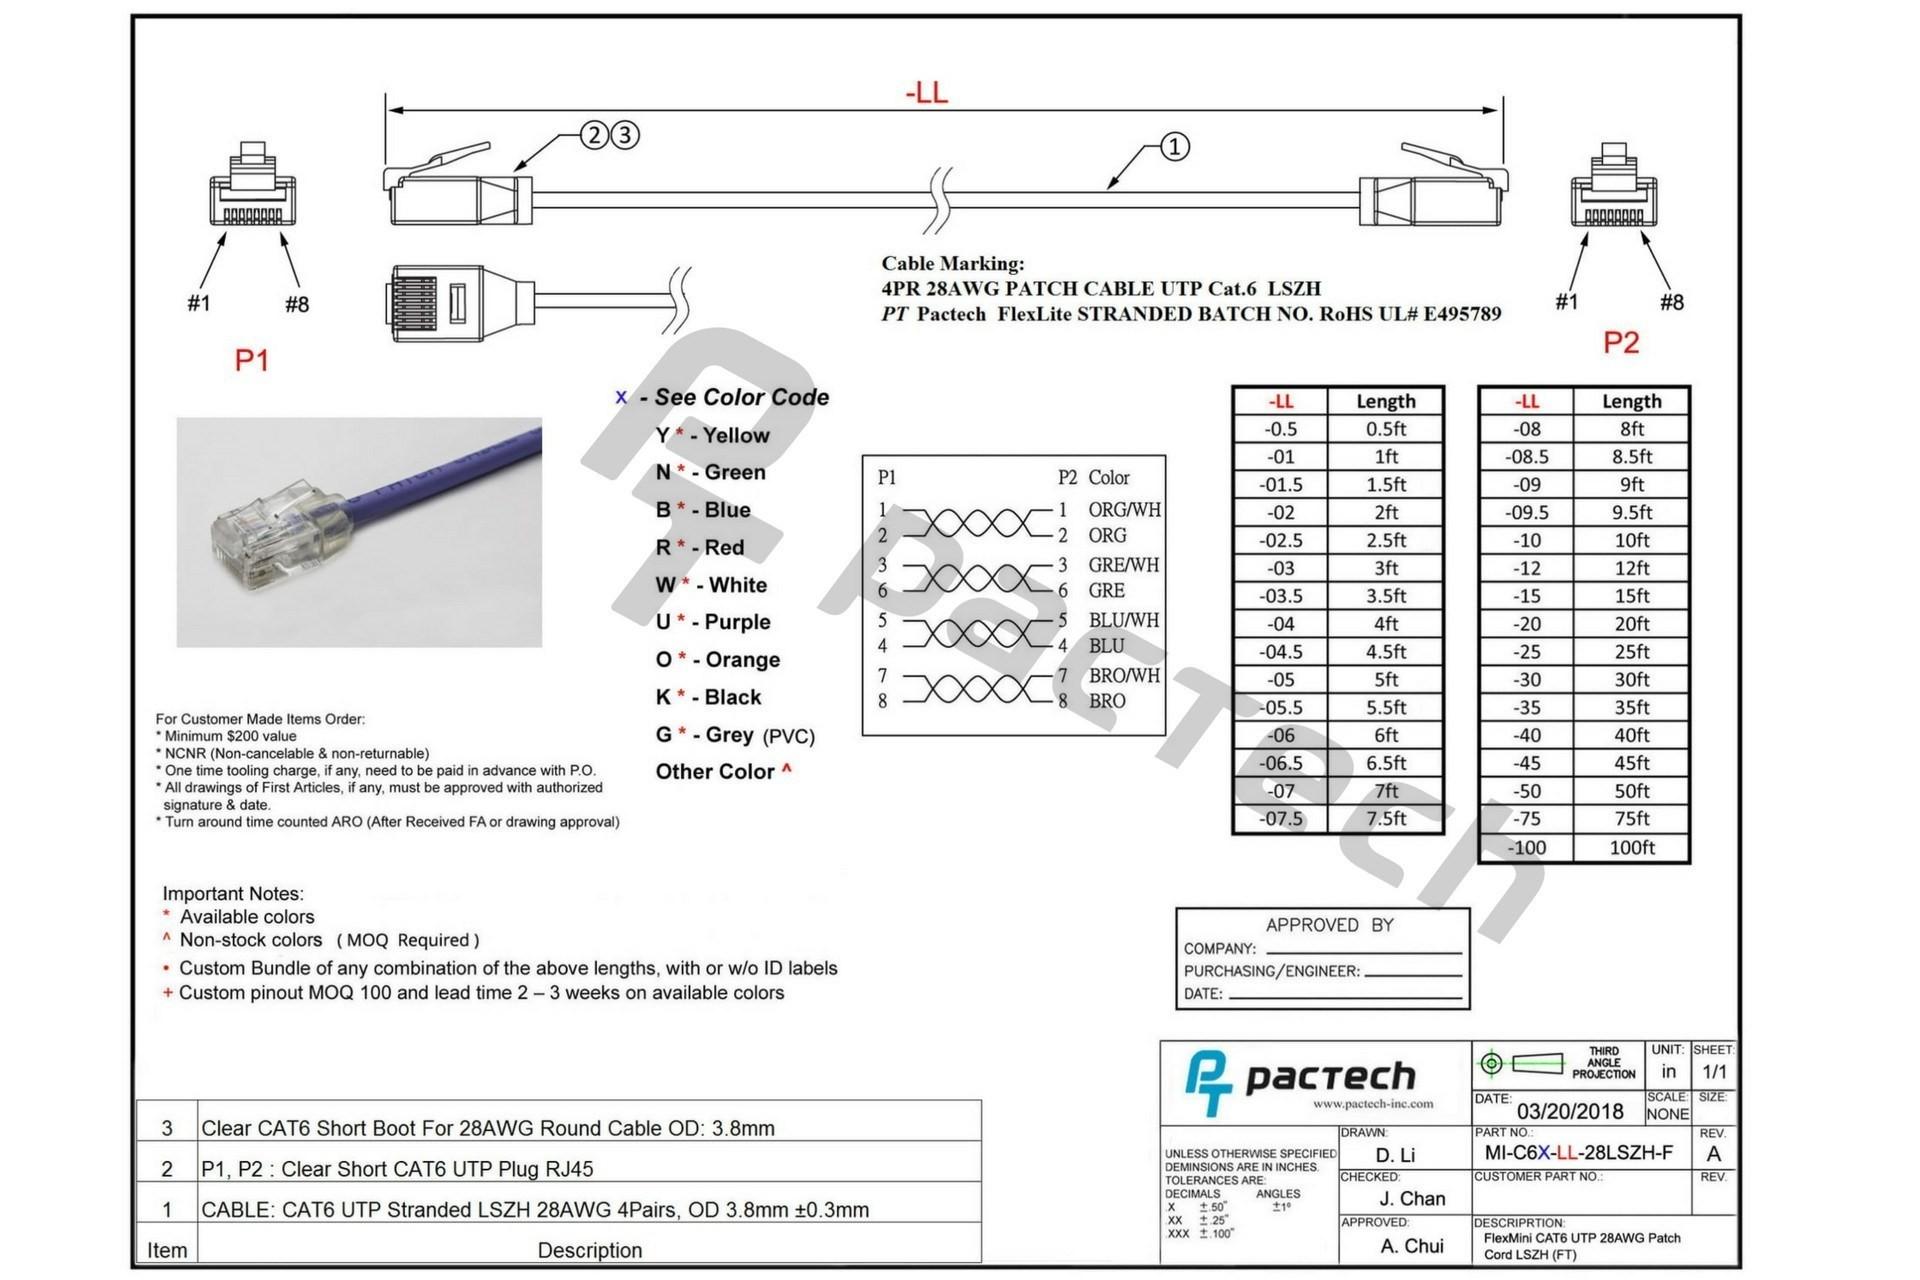 Trailer Connector Wiring Diagram 3 Way Plug Wiring Of Trailer Connector Wiring Diagram 51 New Wiring Diagram for Trailer Lights Gallery